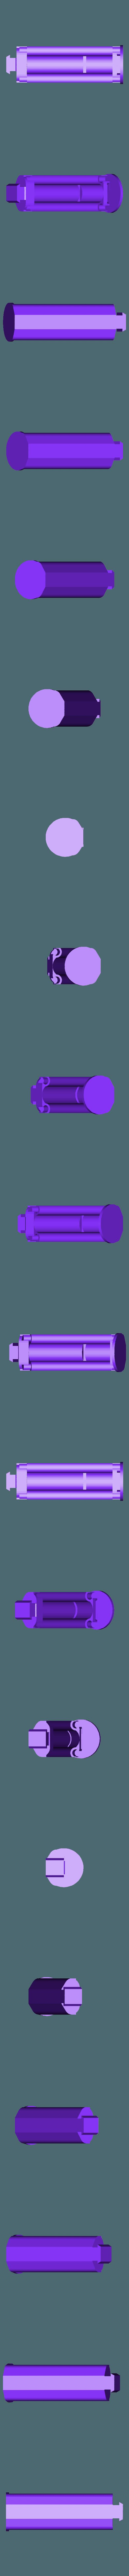 support_2kg_v4.stl Télécharger fichier STL gratuit spool support 2.3 kg • Objet à imprimer en 3D, xpj